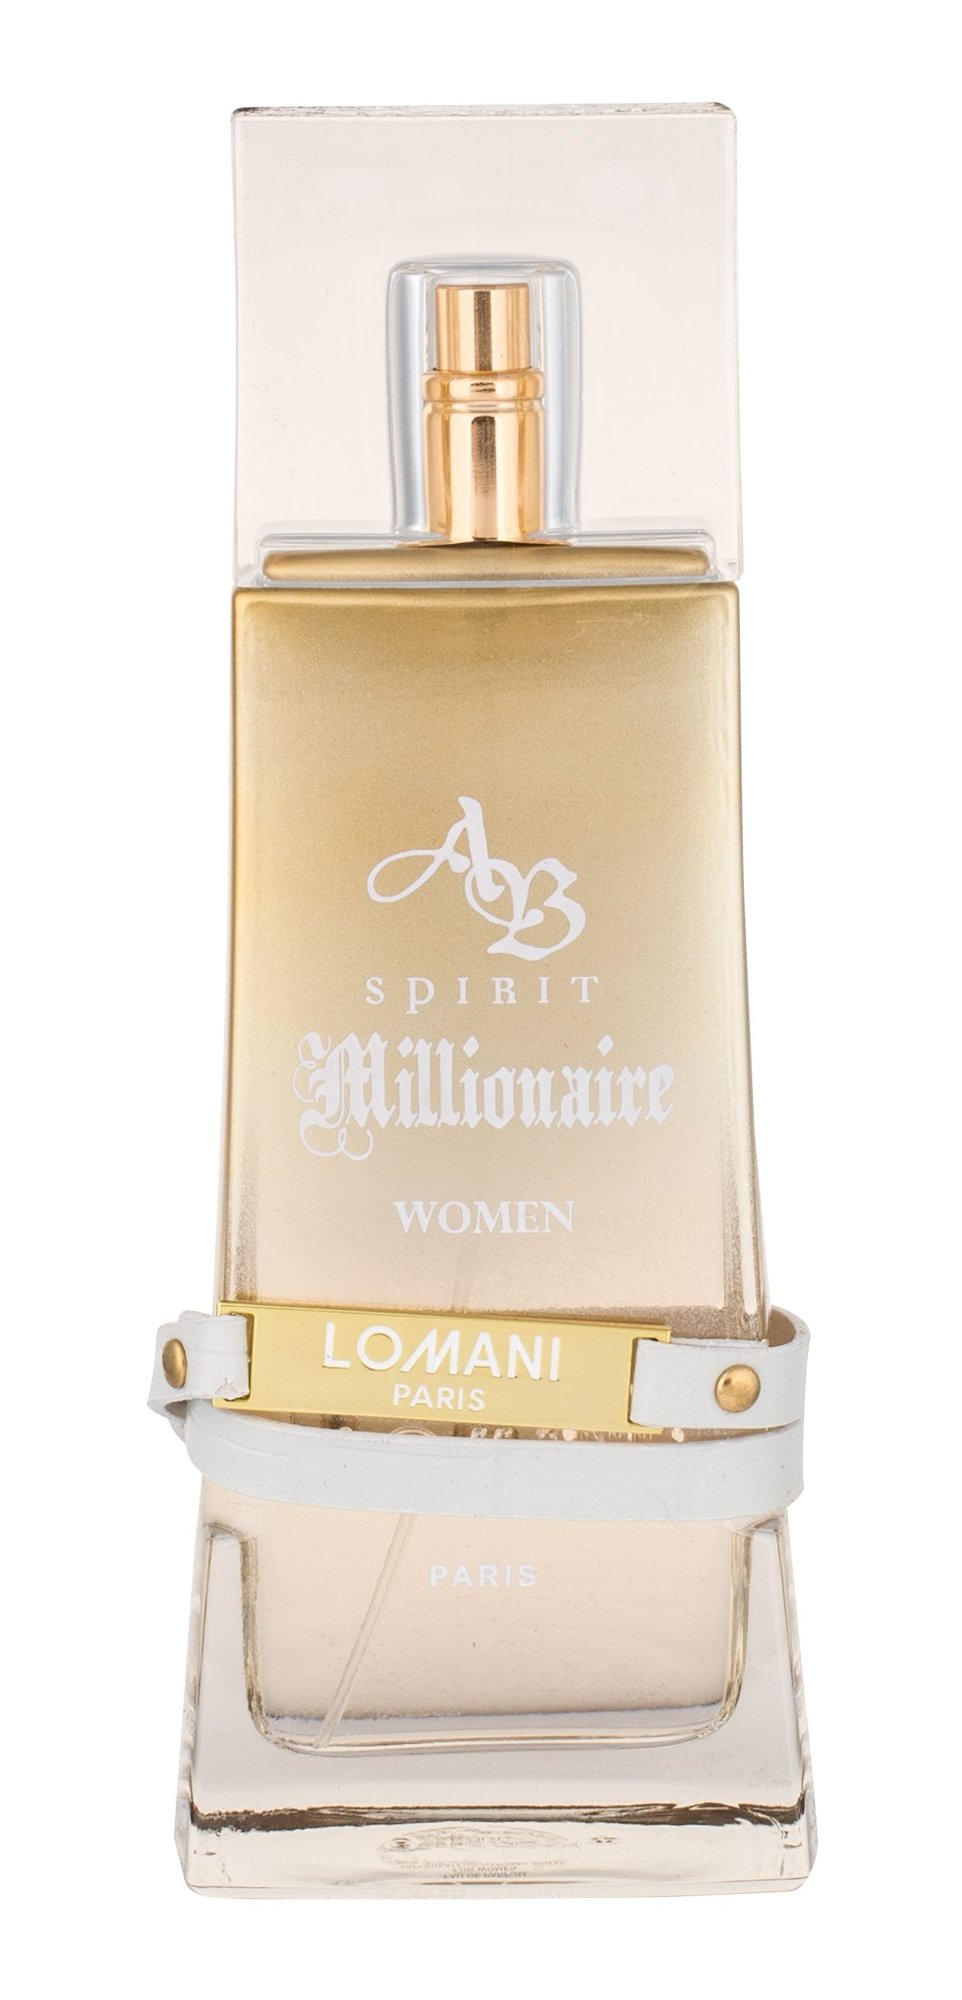 Lomani AB Spirit Millionaire Women EDP 100ml